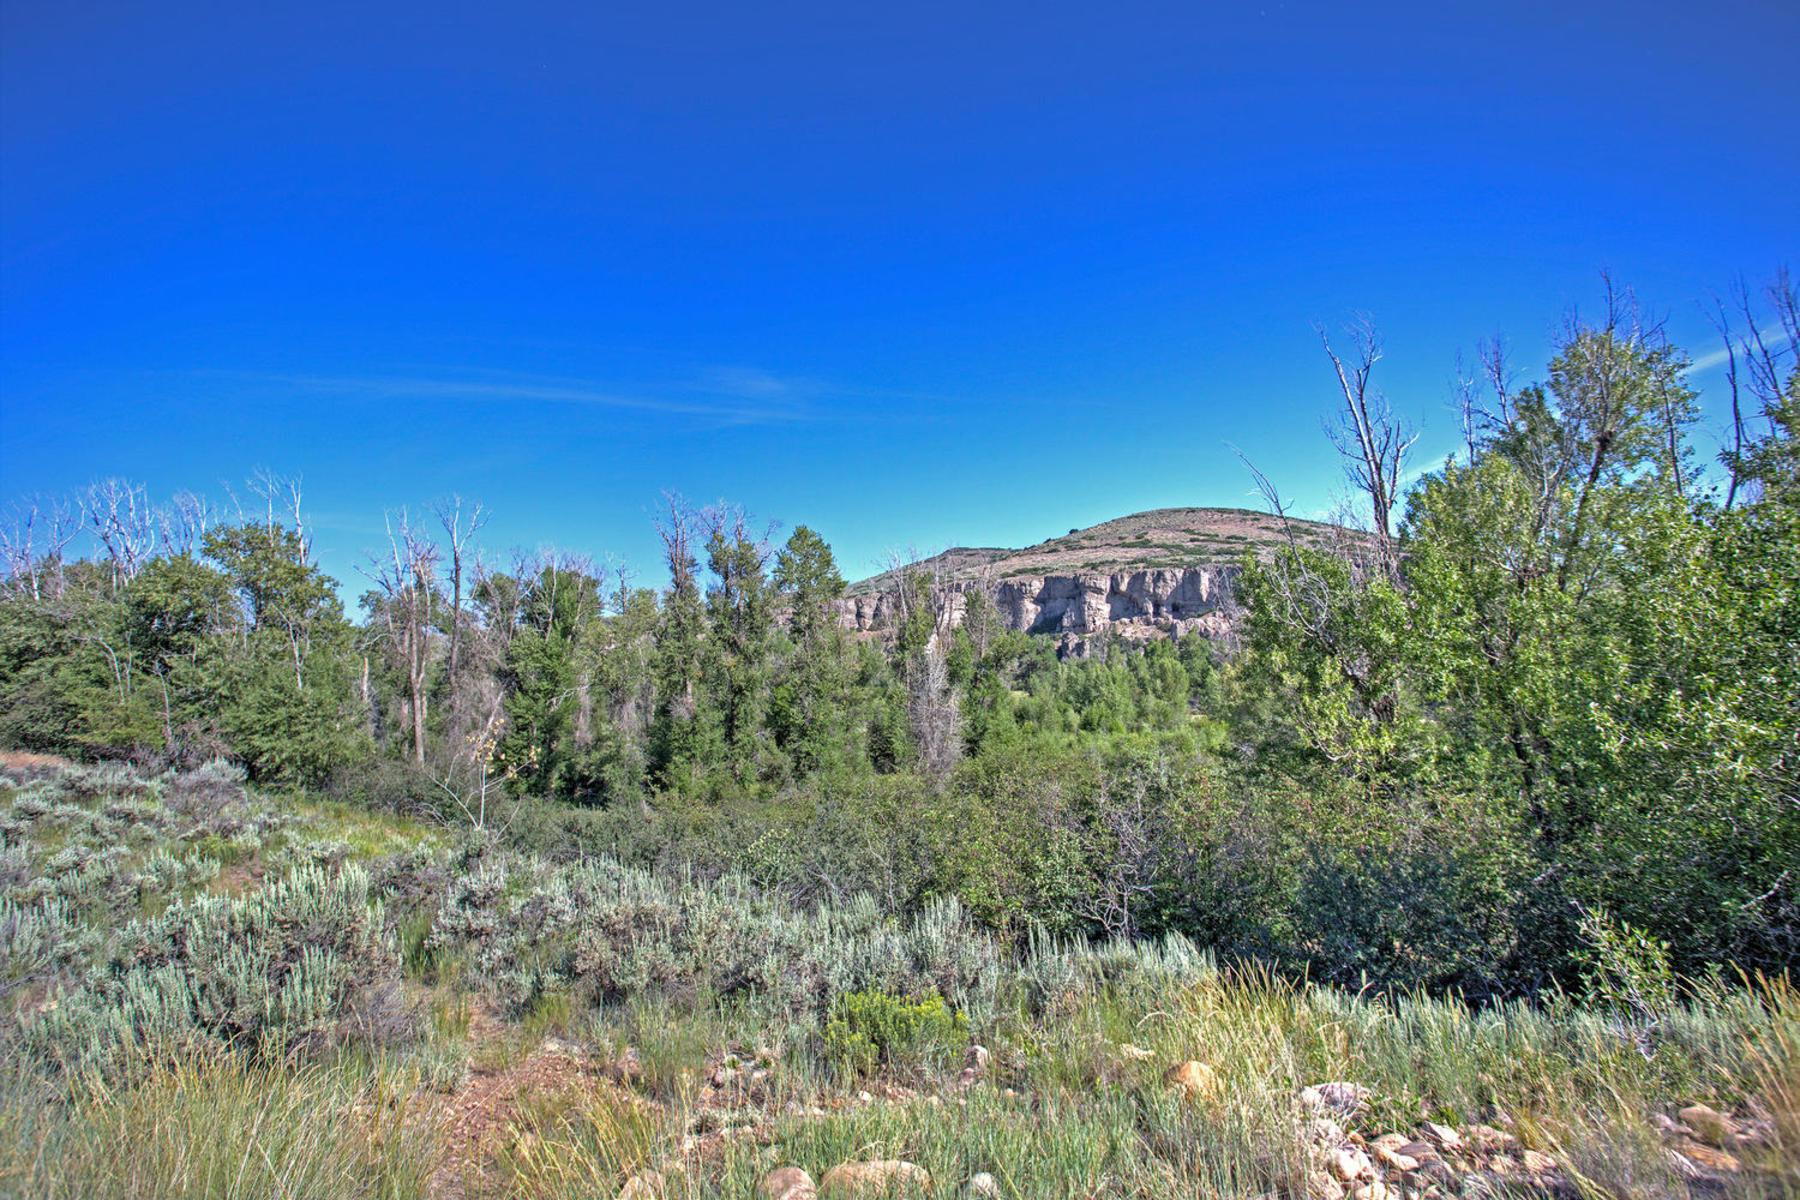 Земля для того Продажа на River Front Home Site at Victory Ranch with Buyer Agency Bonus 6795 E Cliff View Ct Heber City, Юта, 84032 Соединенные Штаты